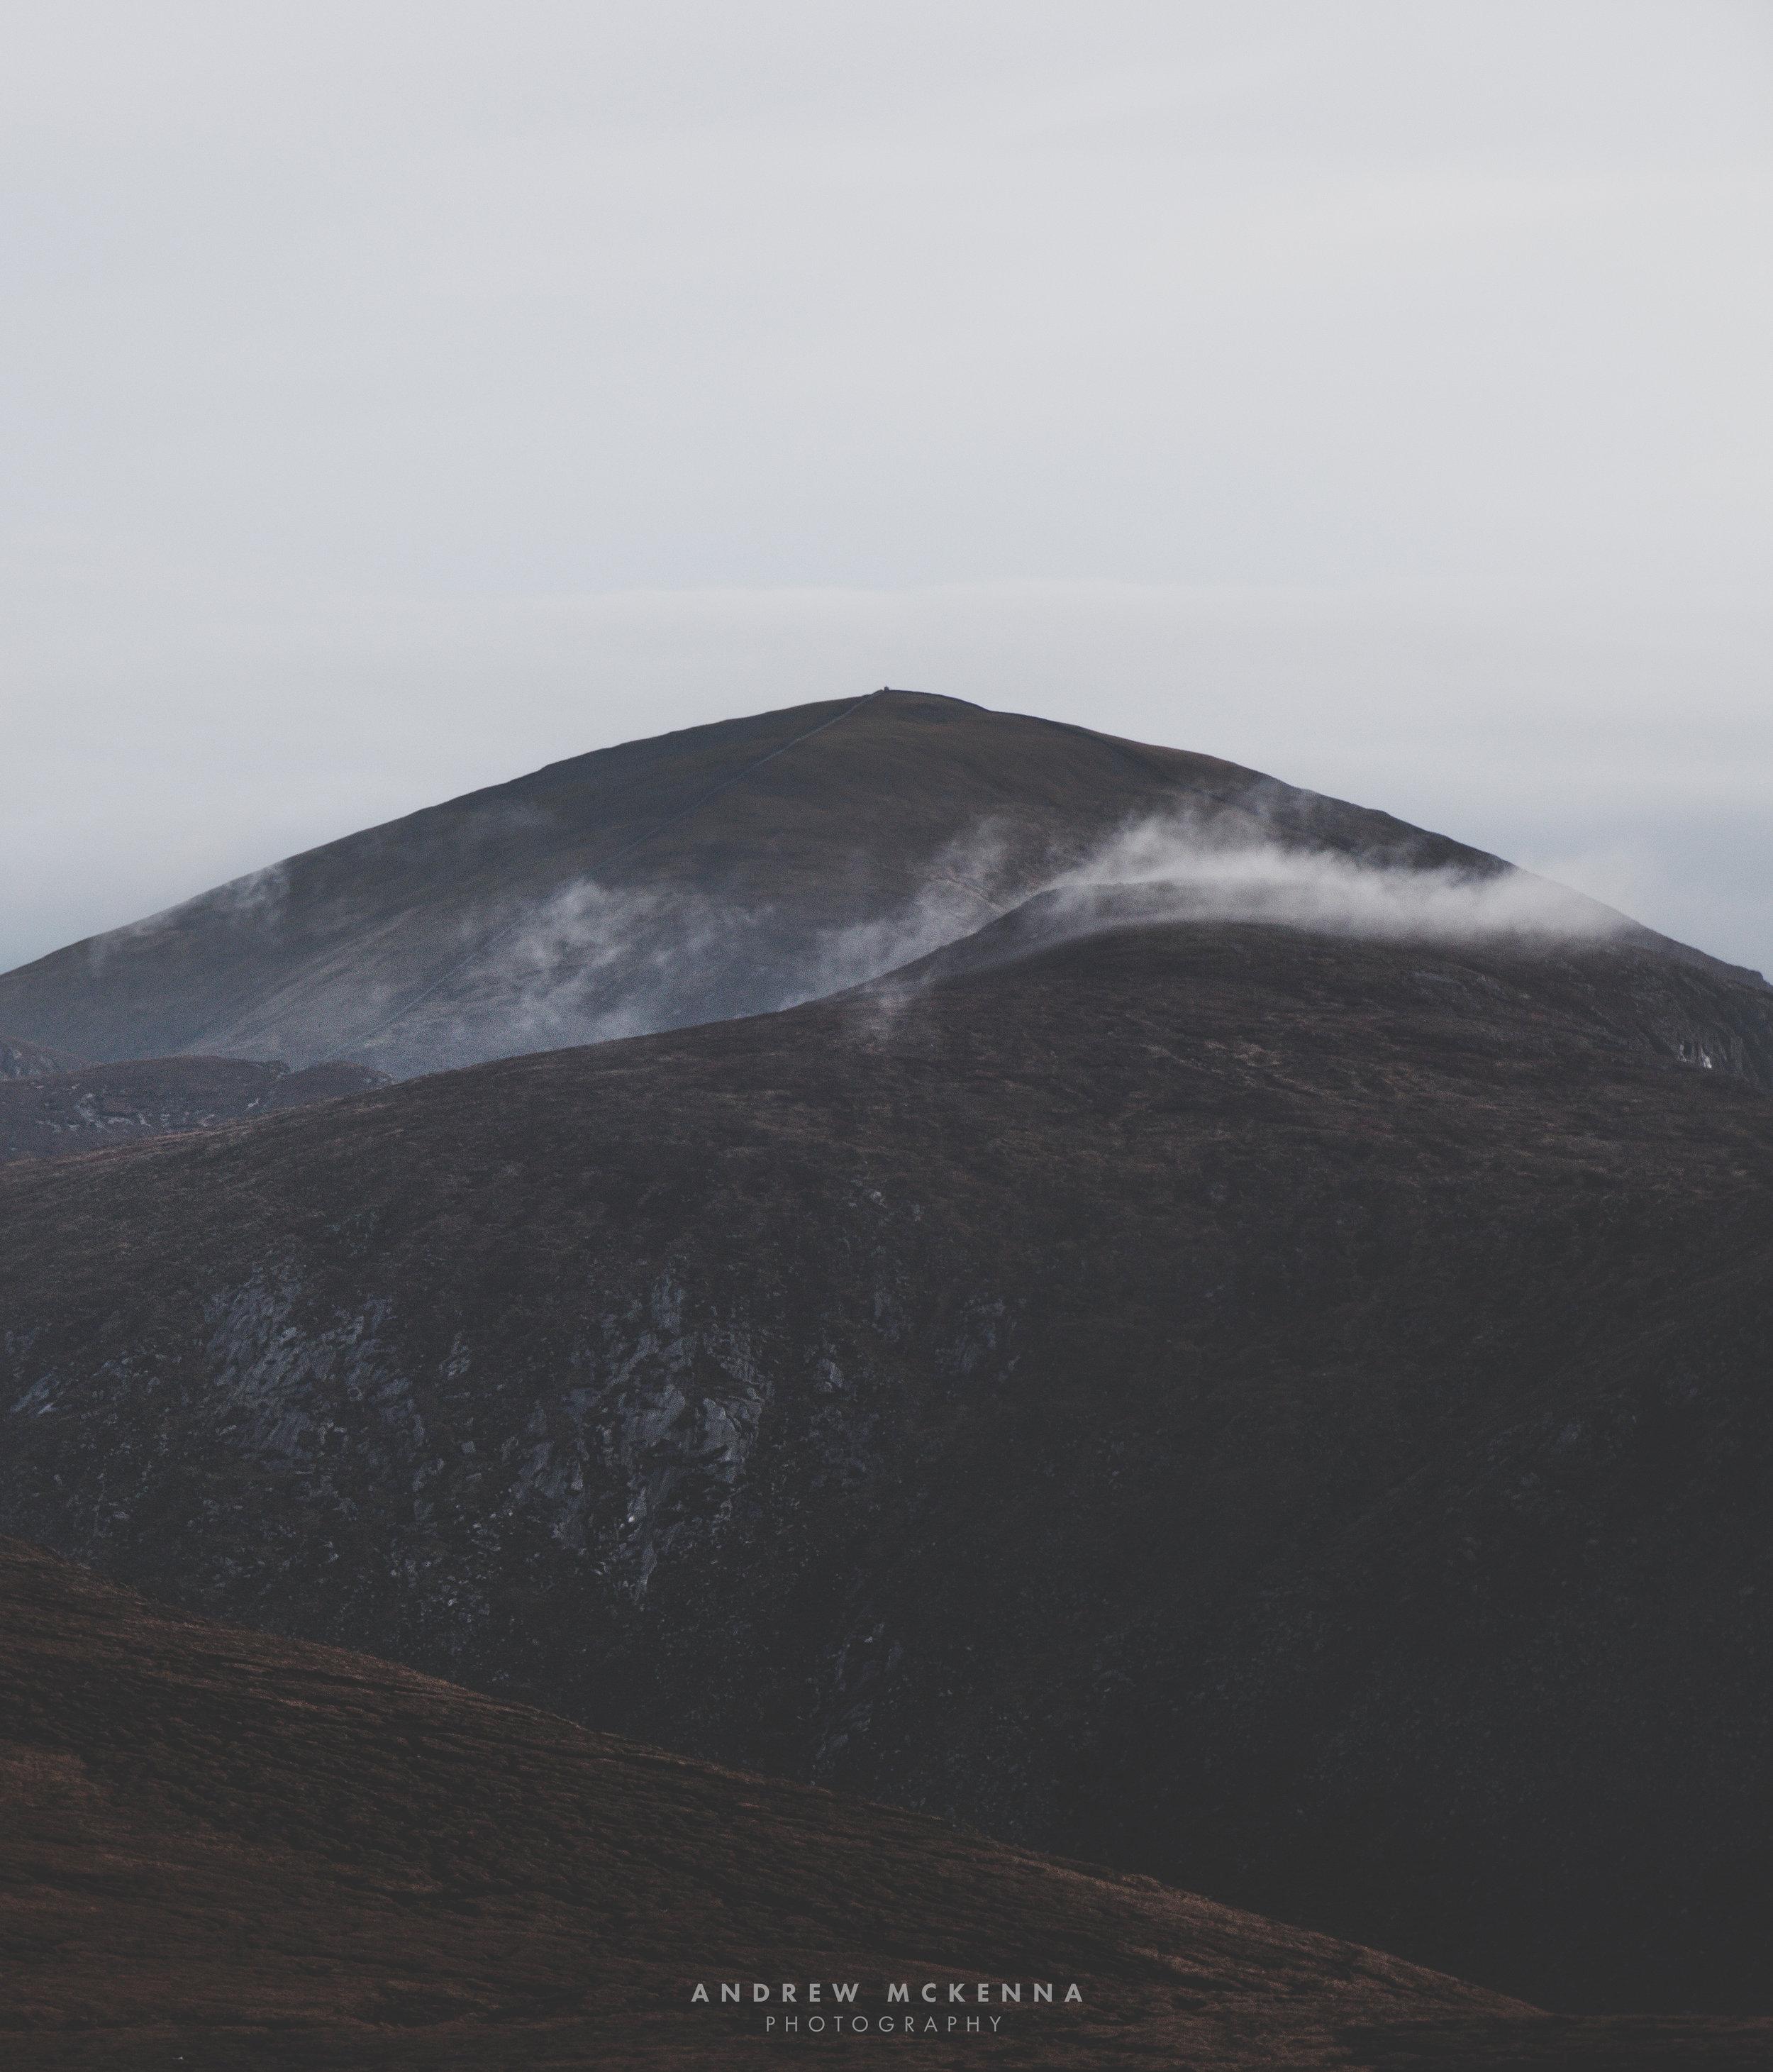 Slieve Donard Slieve Doan Mourne Mountains Photography Andrew McKenna County Down